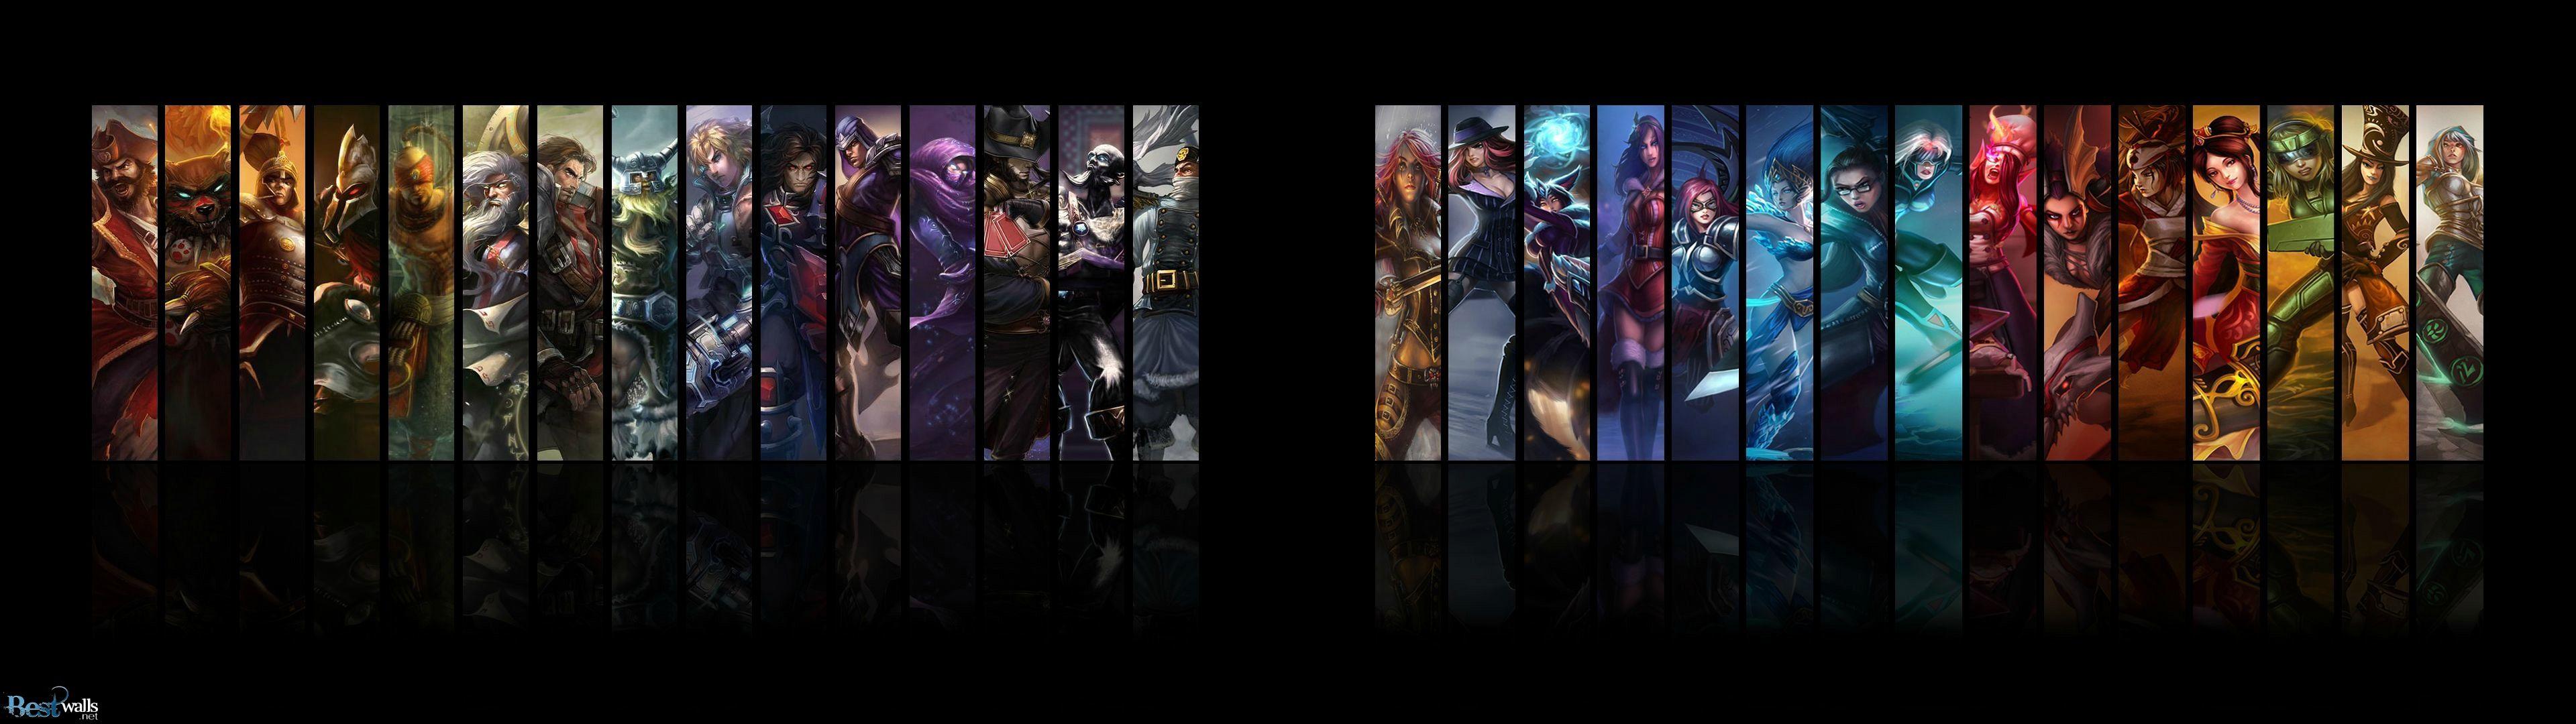 League Of Legends 3840 1080 Pixel Dual Monitor Wallpaper Dual